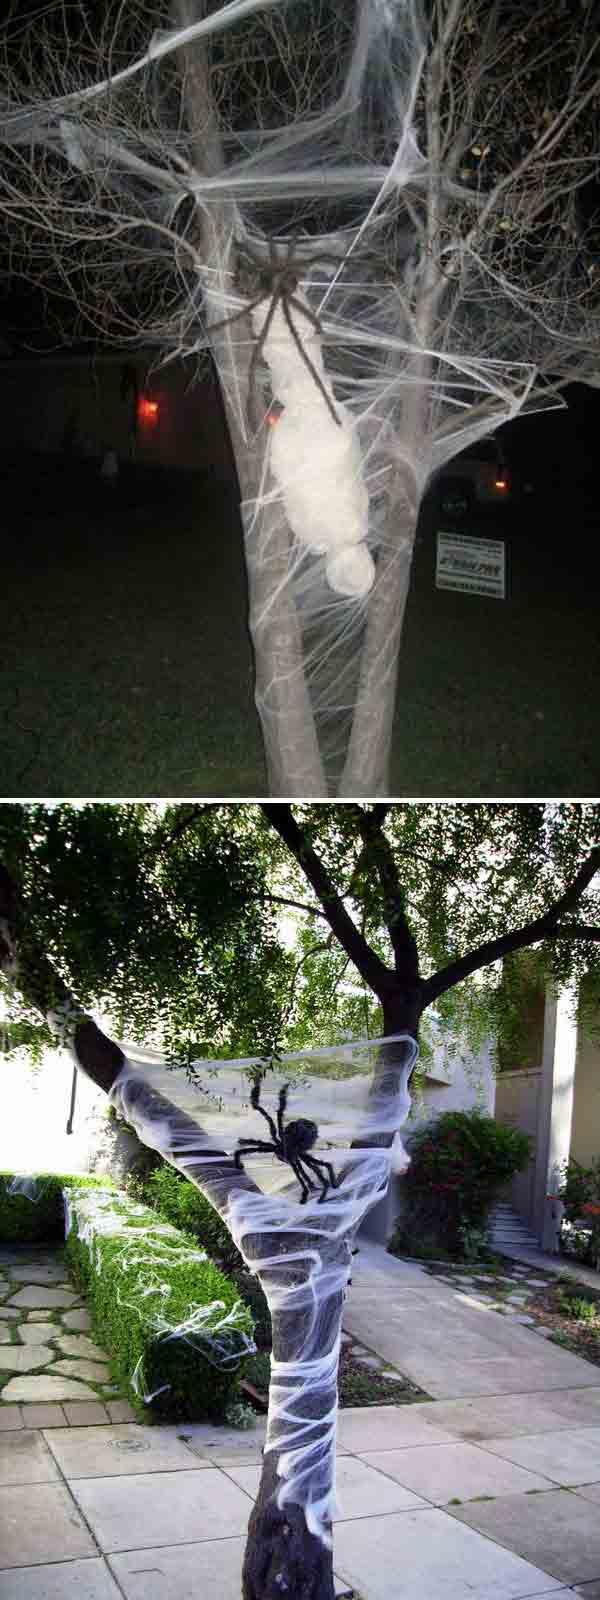 decorate-outdoor-tree-for-halloween-16